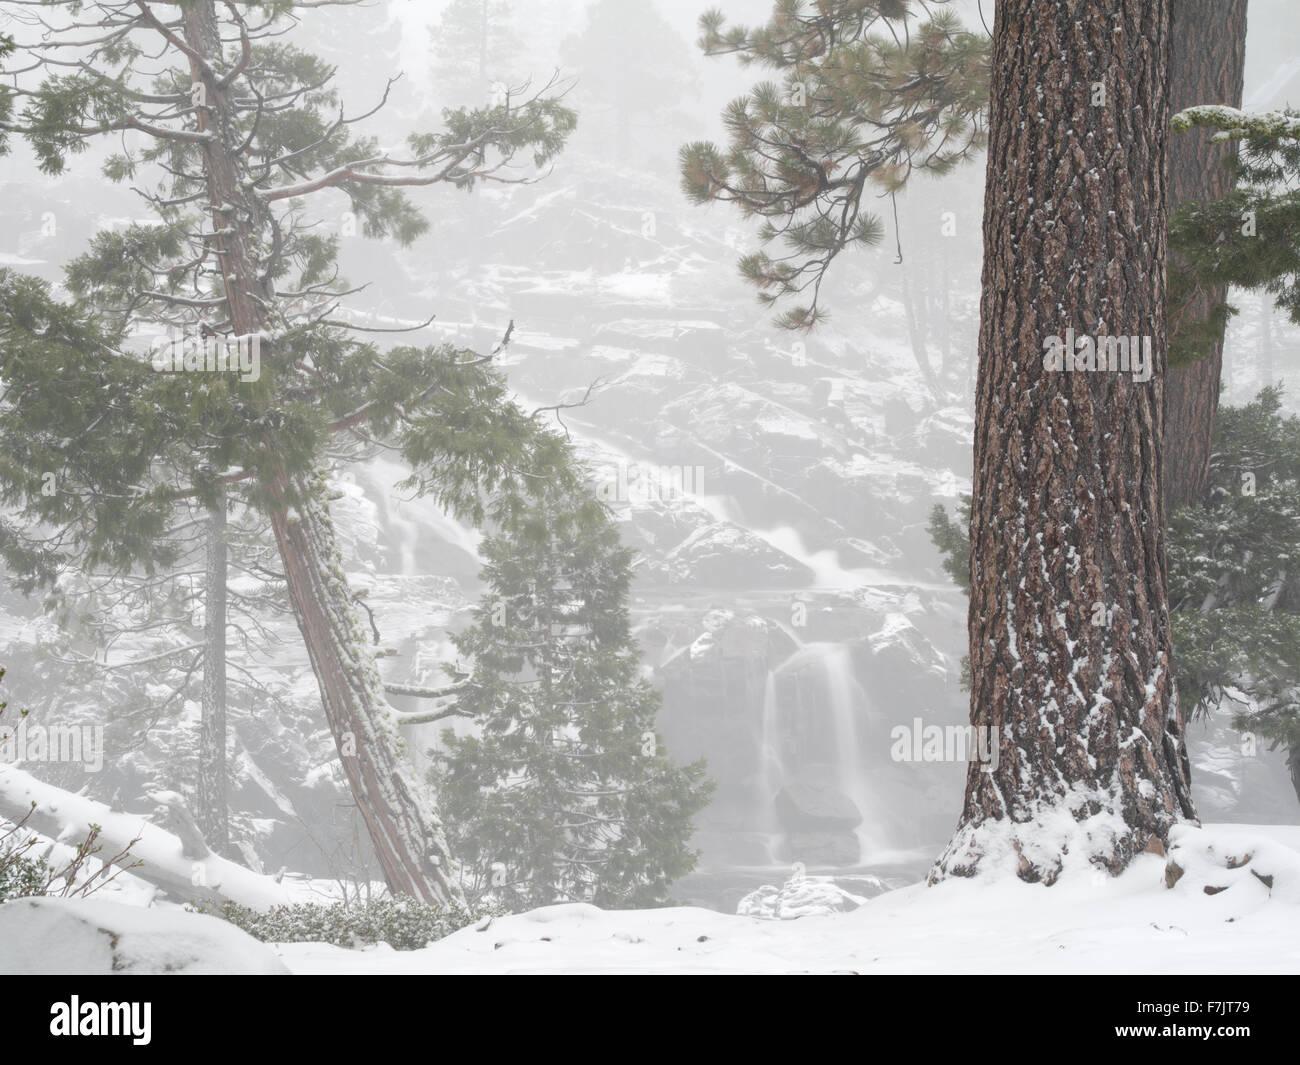 Glen Alpine Falls minutes après les chutes de neige fraîche. Lake Tahoe, California Photo Stock